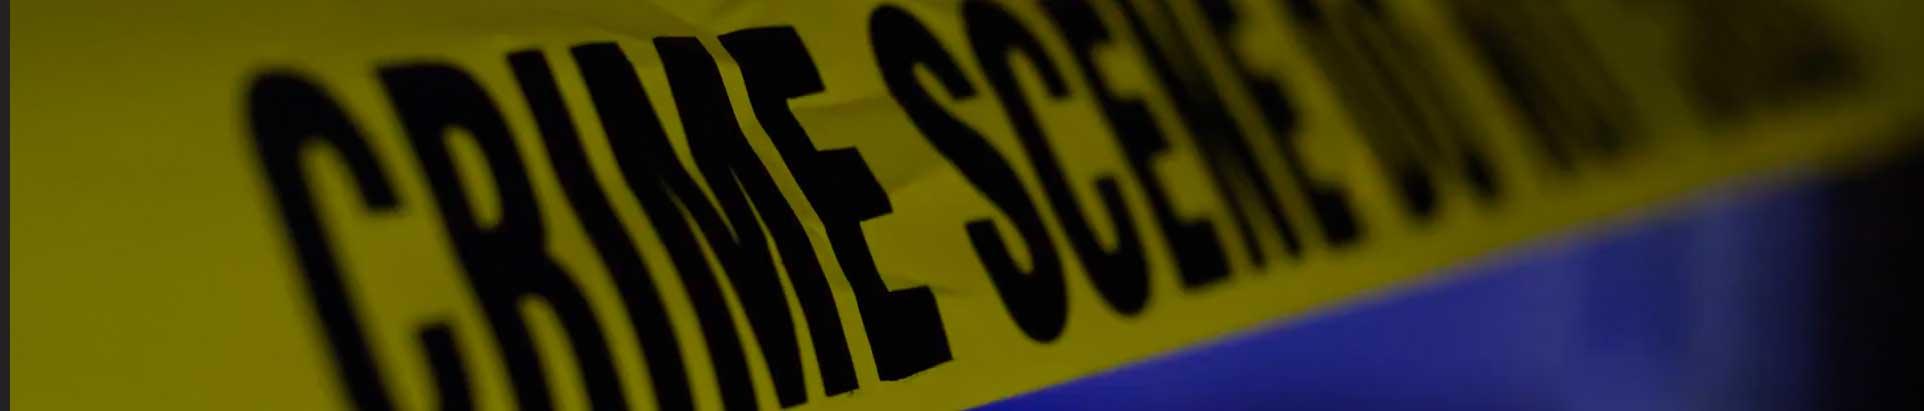 Crime Scene Yellow Tape